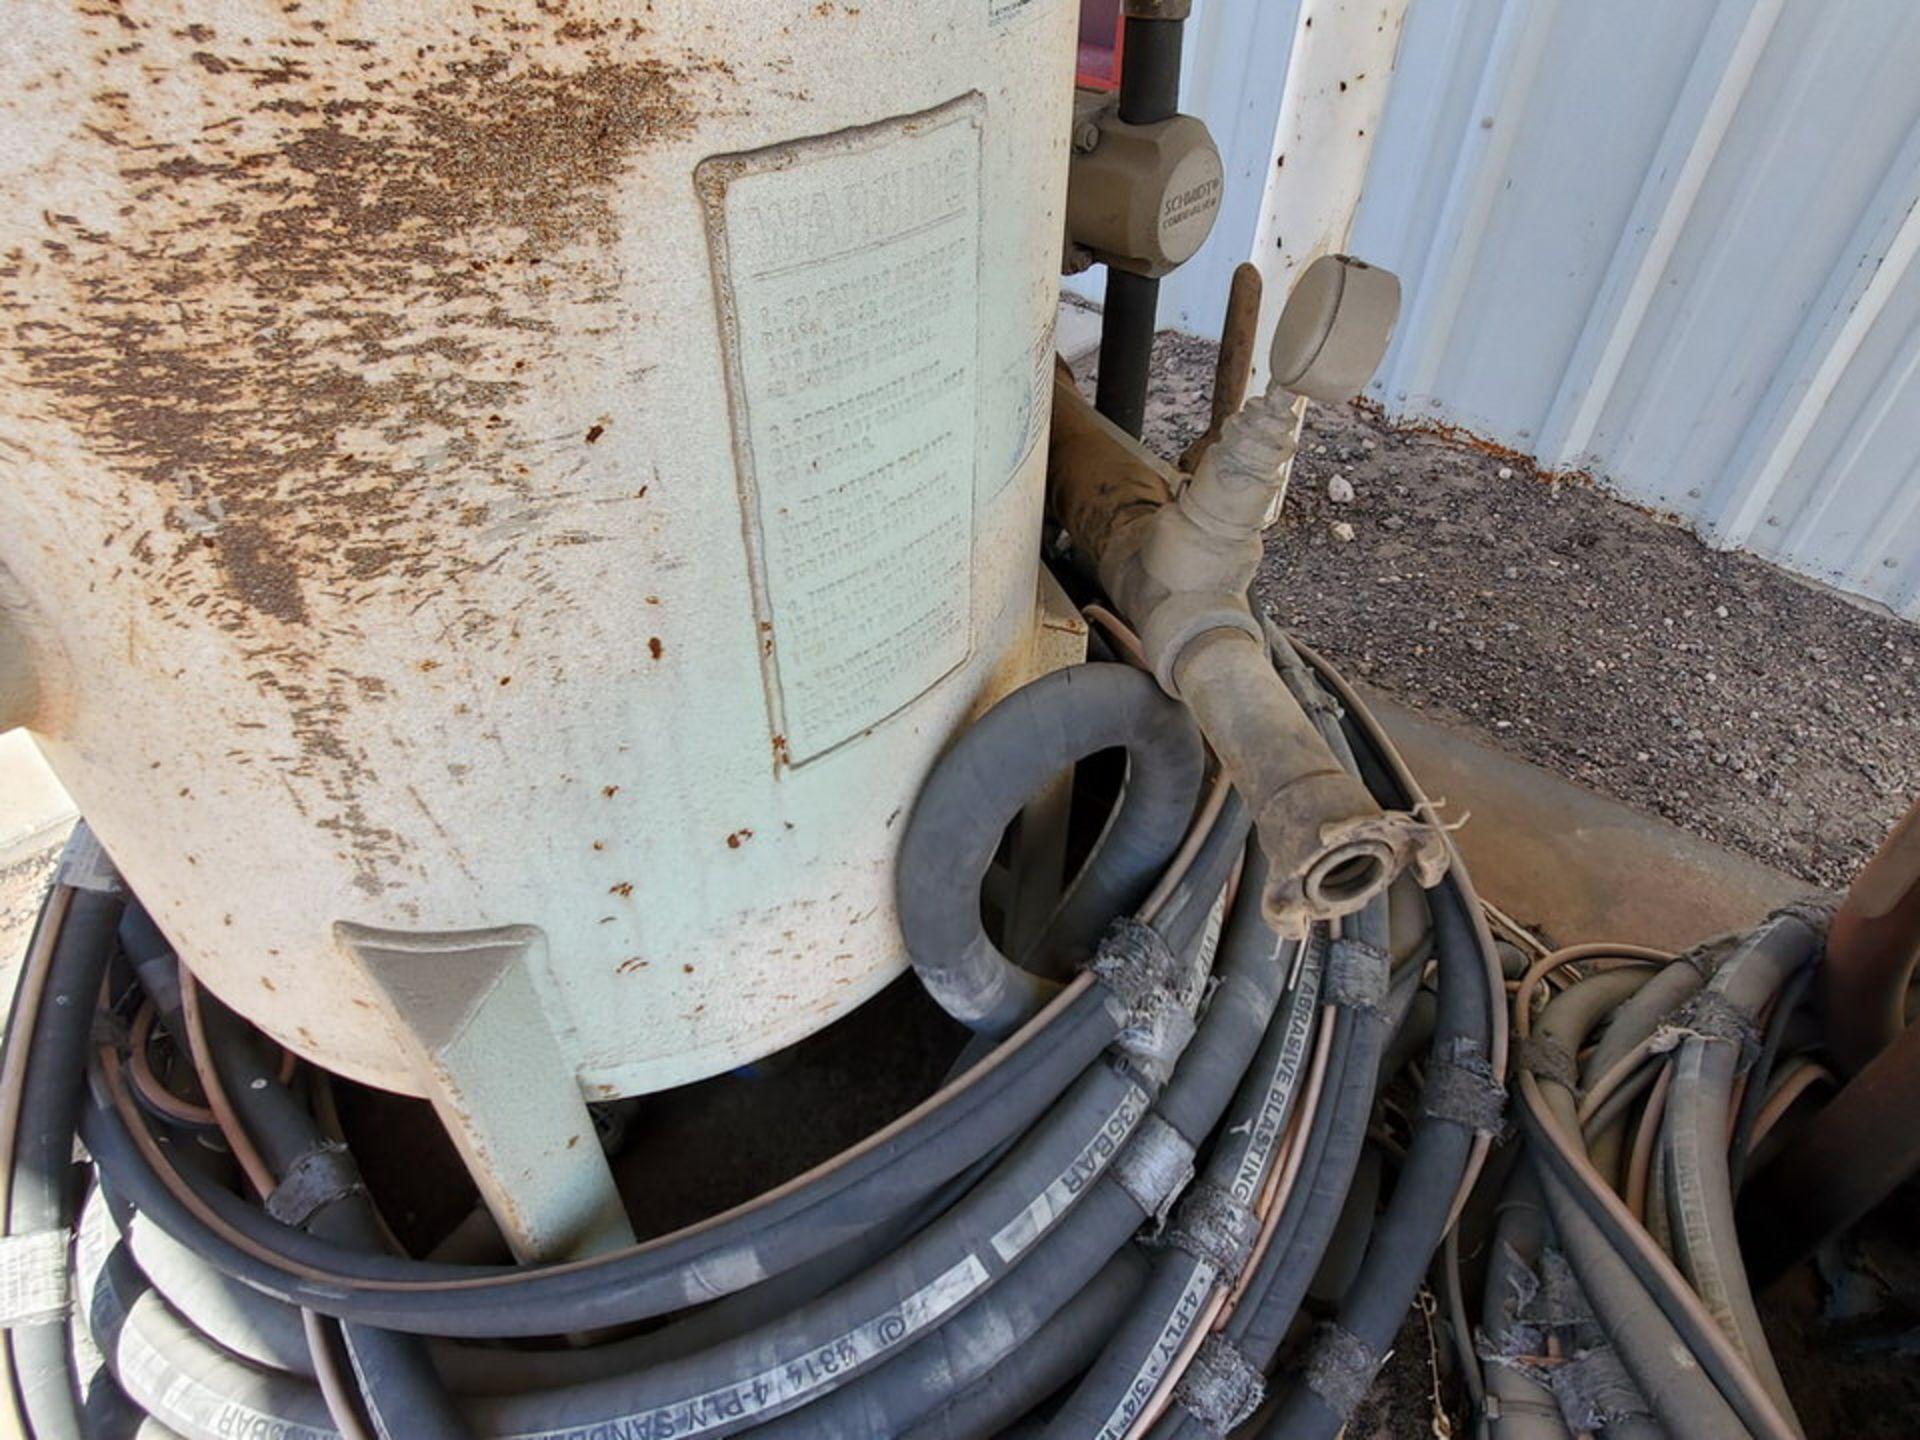 Schmidt 12' Portable Abrasive Sand Blaster Pot 150psi@250F, -20F@150psi; NB# 10649 - Image 6 of 9